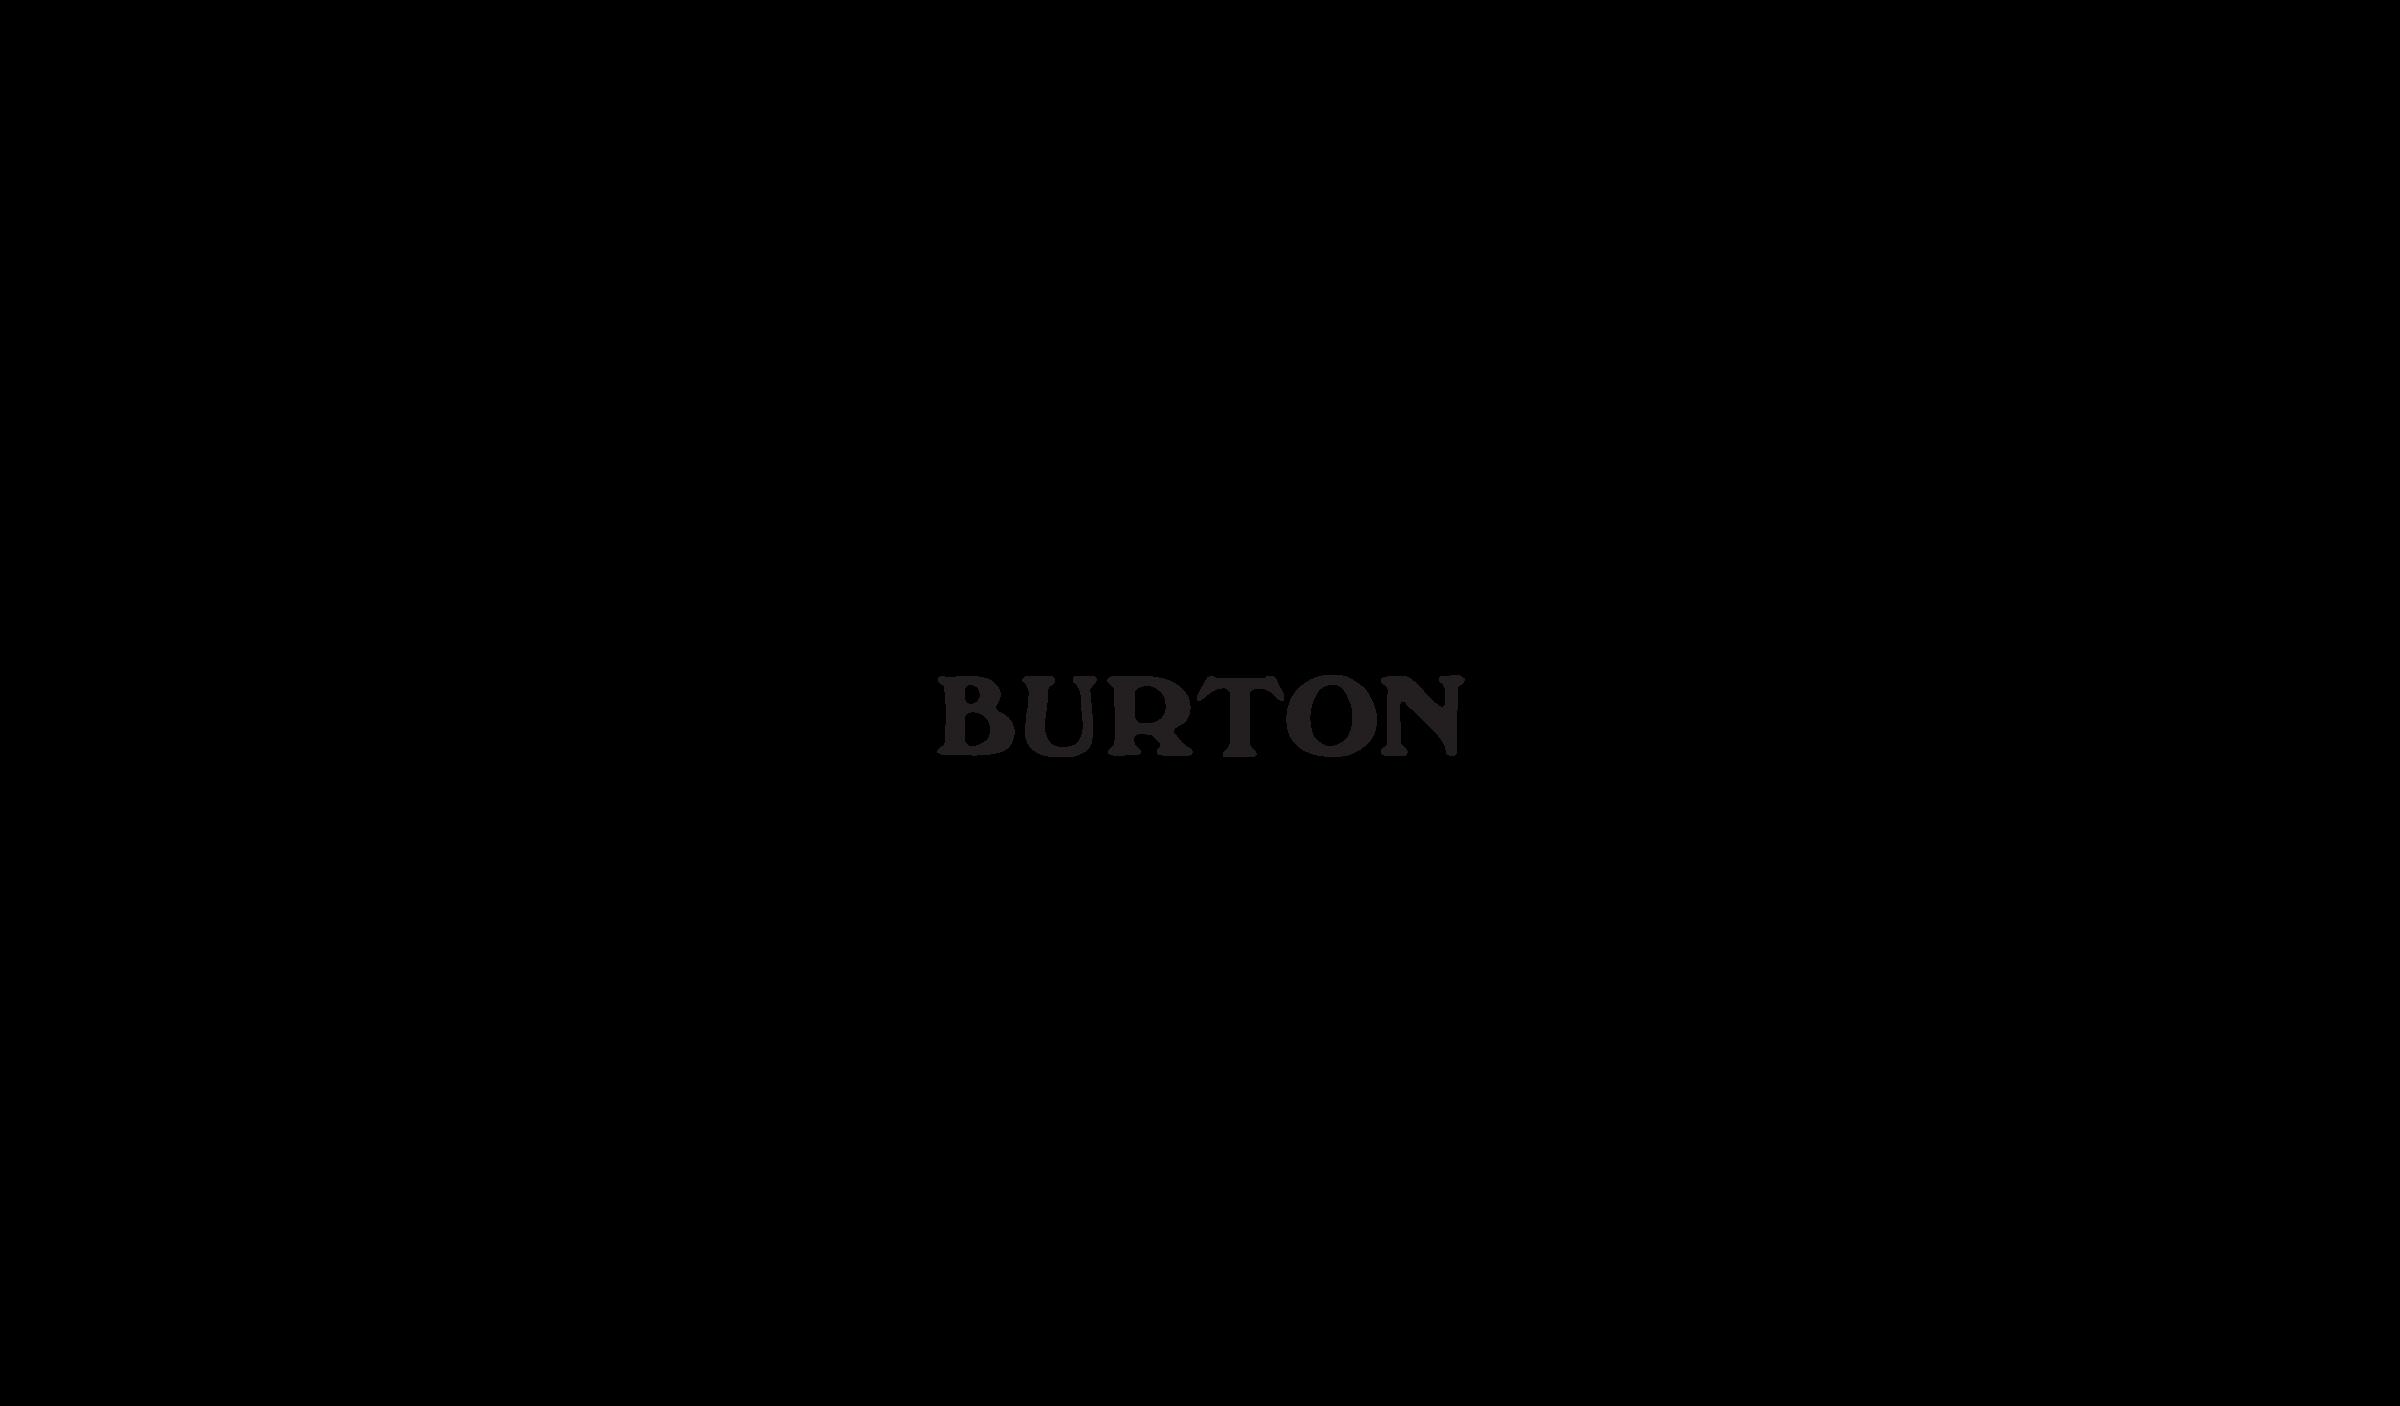 Burton Apparel